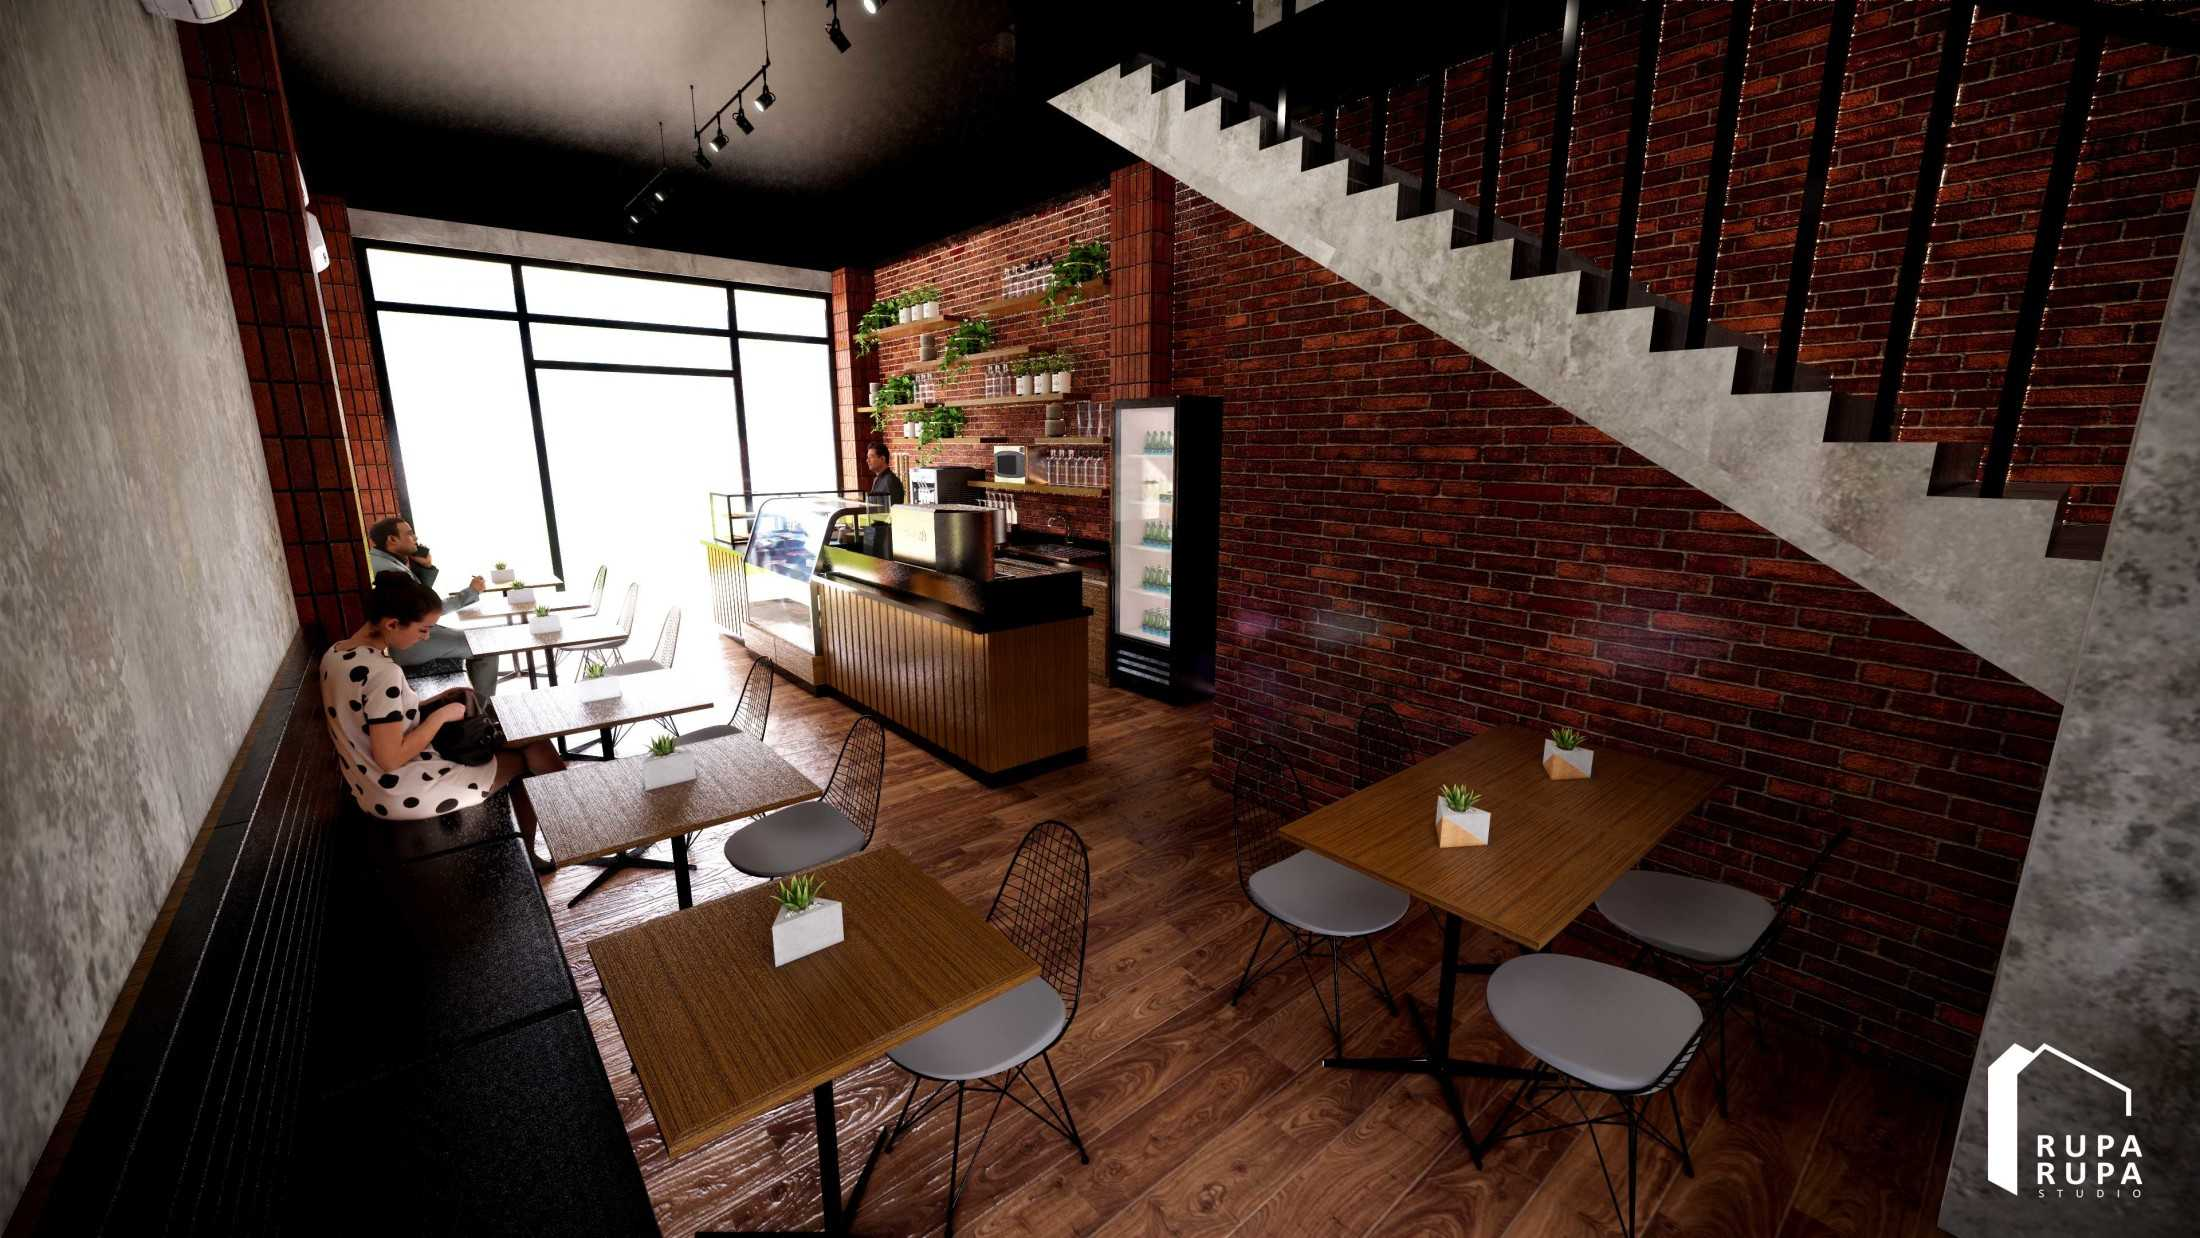 Studio Rupa Rupa Drupadi Corner Cafe Bali, Indonesia Bali, Indonesia Studio-Rupa-Rupa-Drupadi-Corner-Cafe  88062